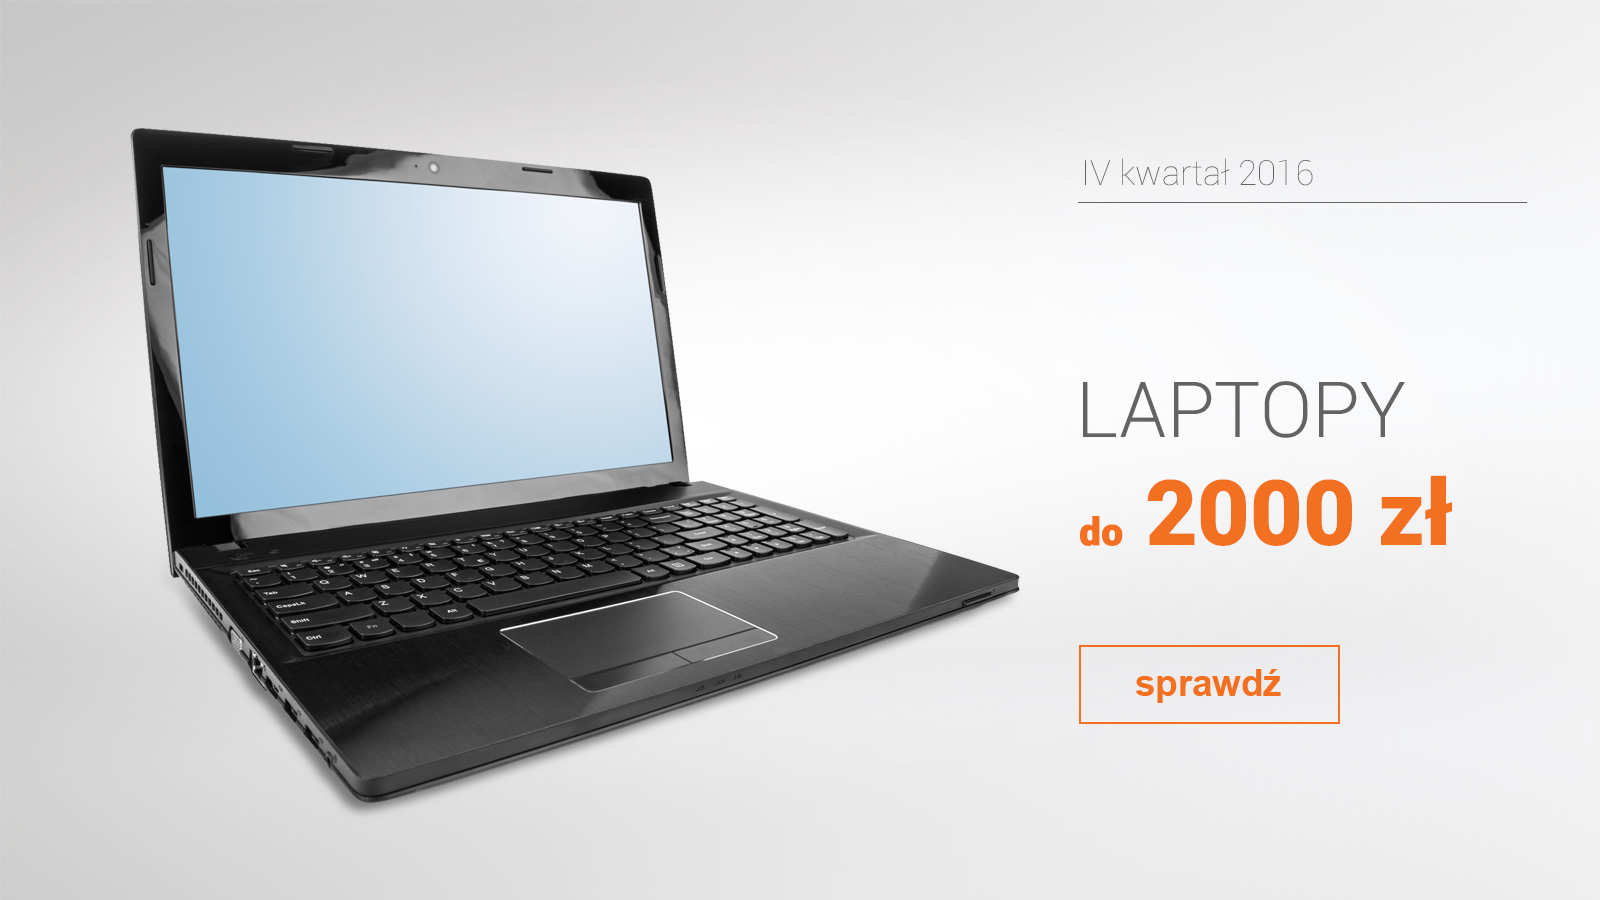 Laptopy do 2000 zł – IV kwartał 2016